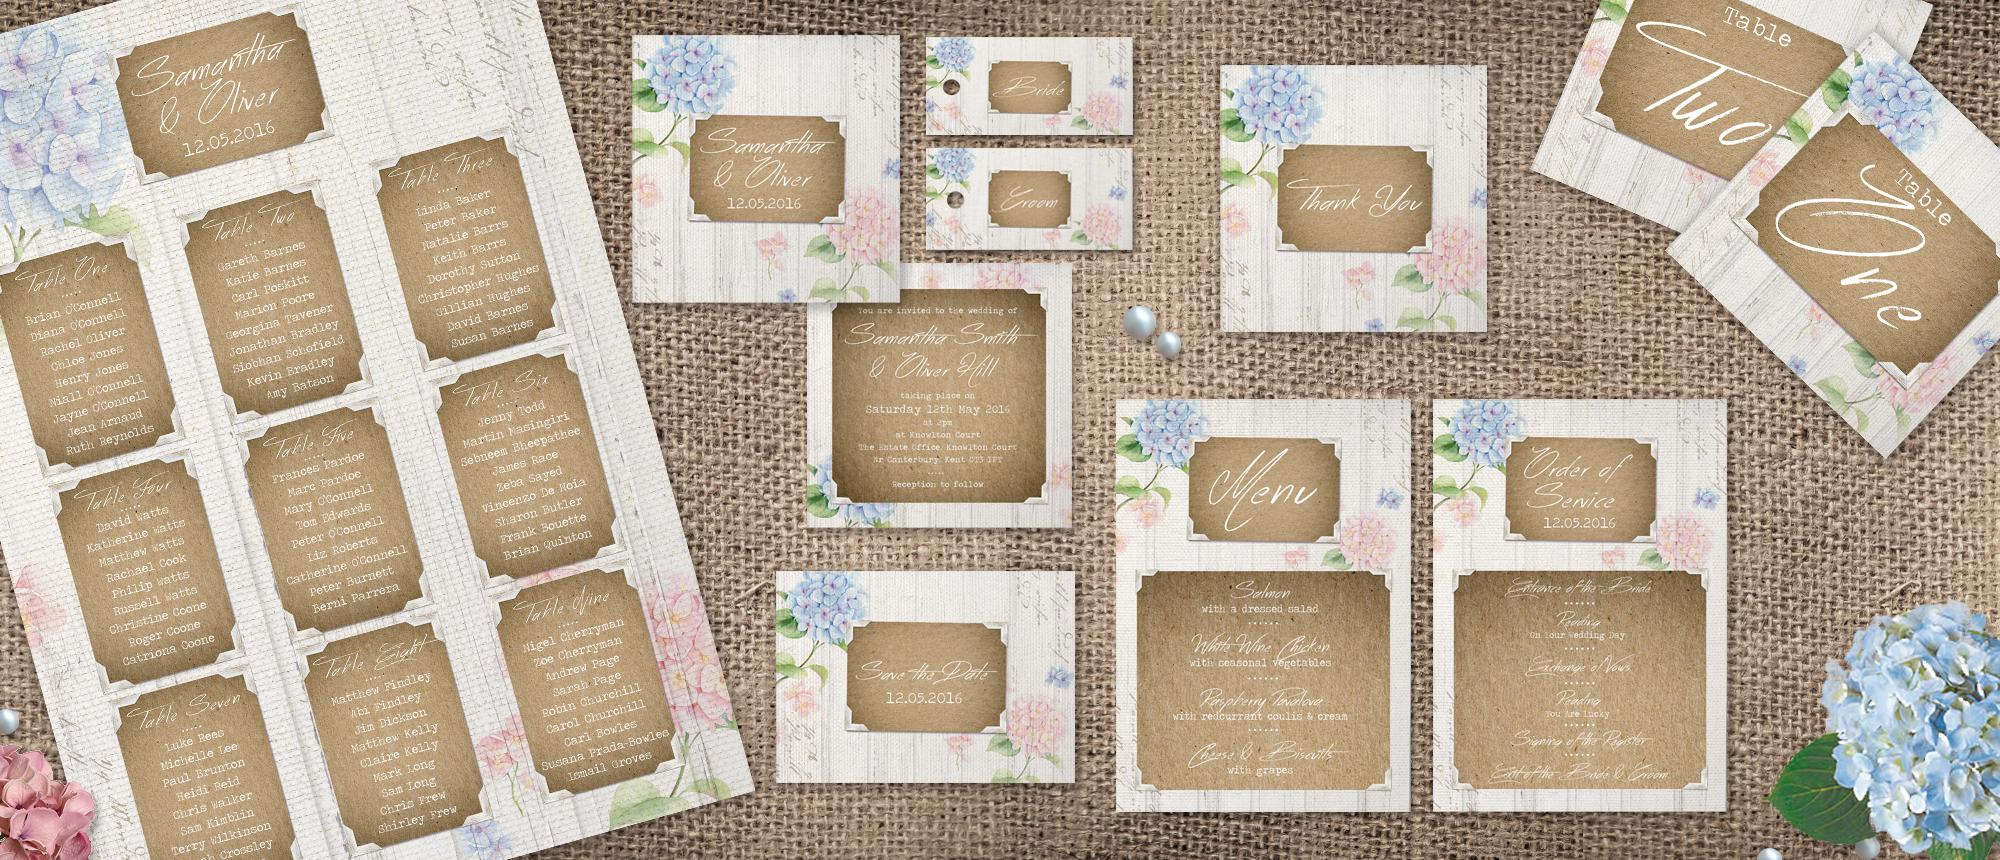 Heart Invites_Collection_Hydrangea Garden